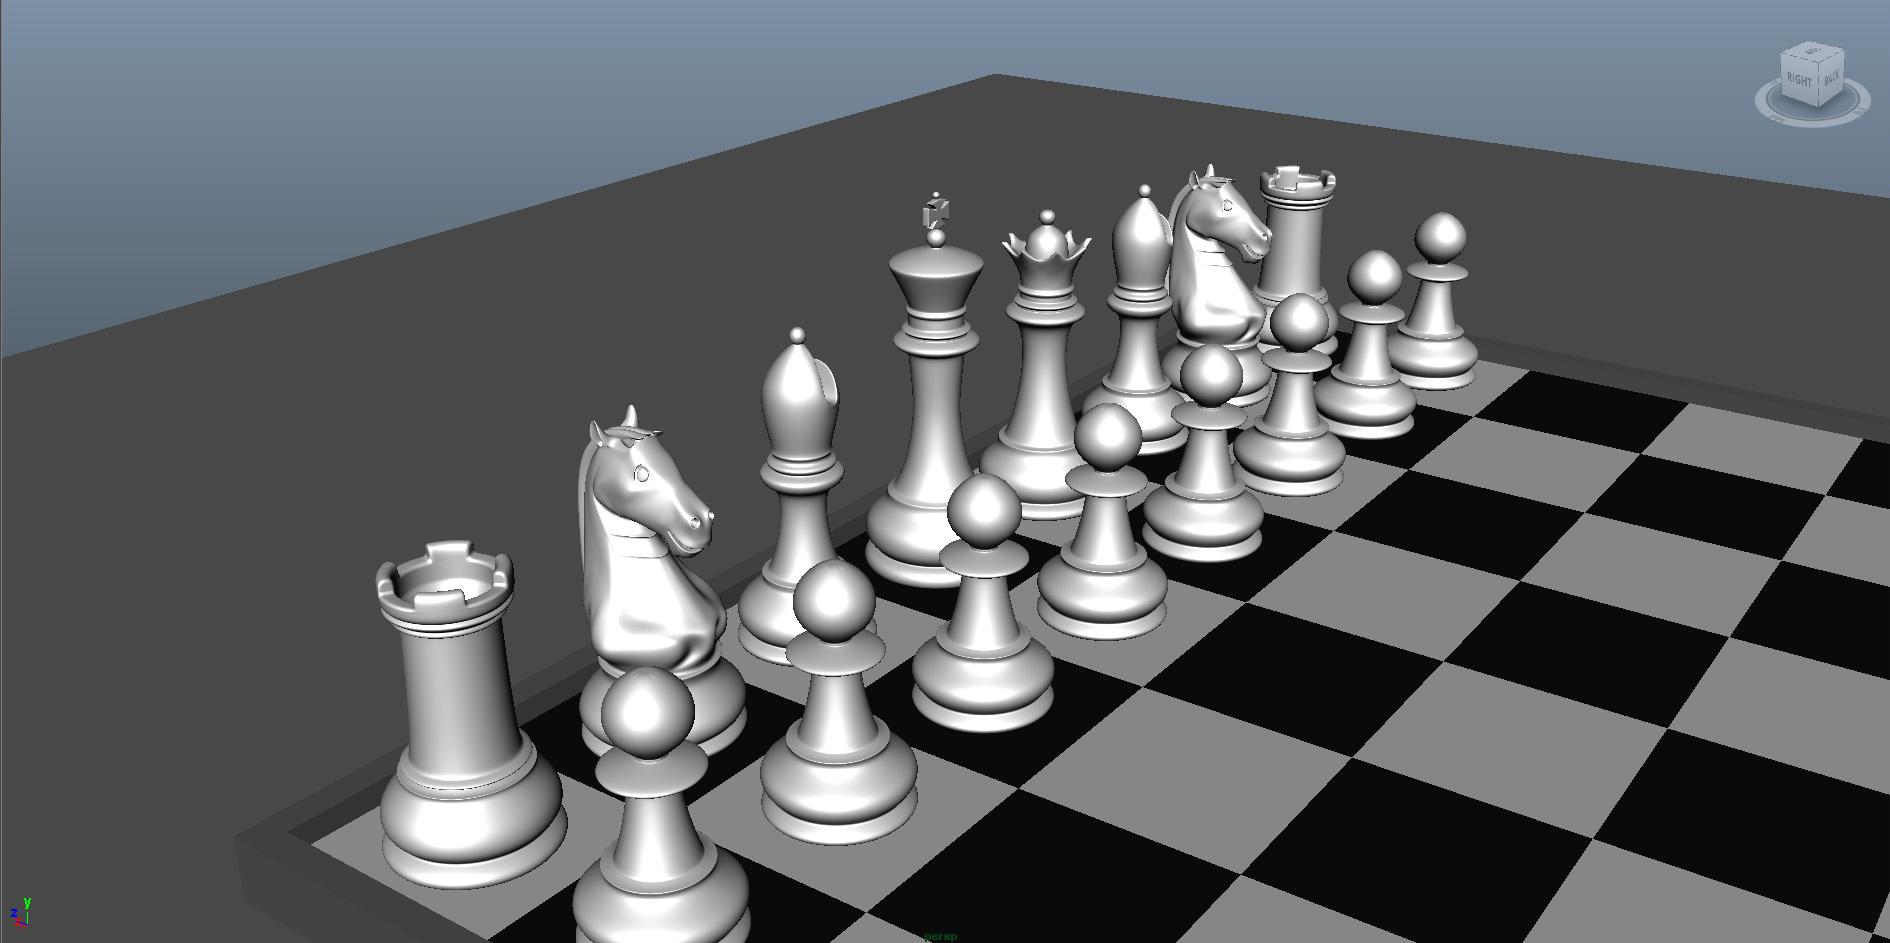 chess 3 3d model fbx ma mb obj 153543